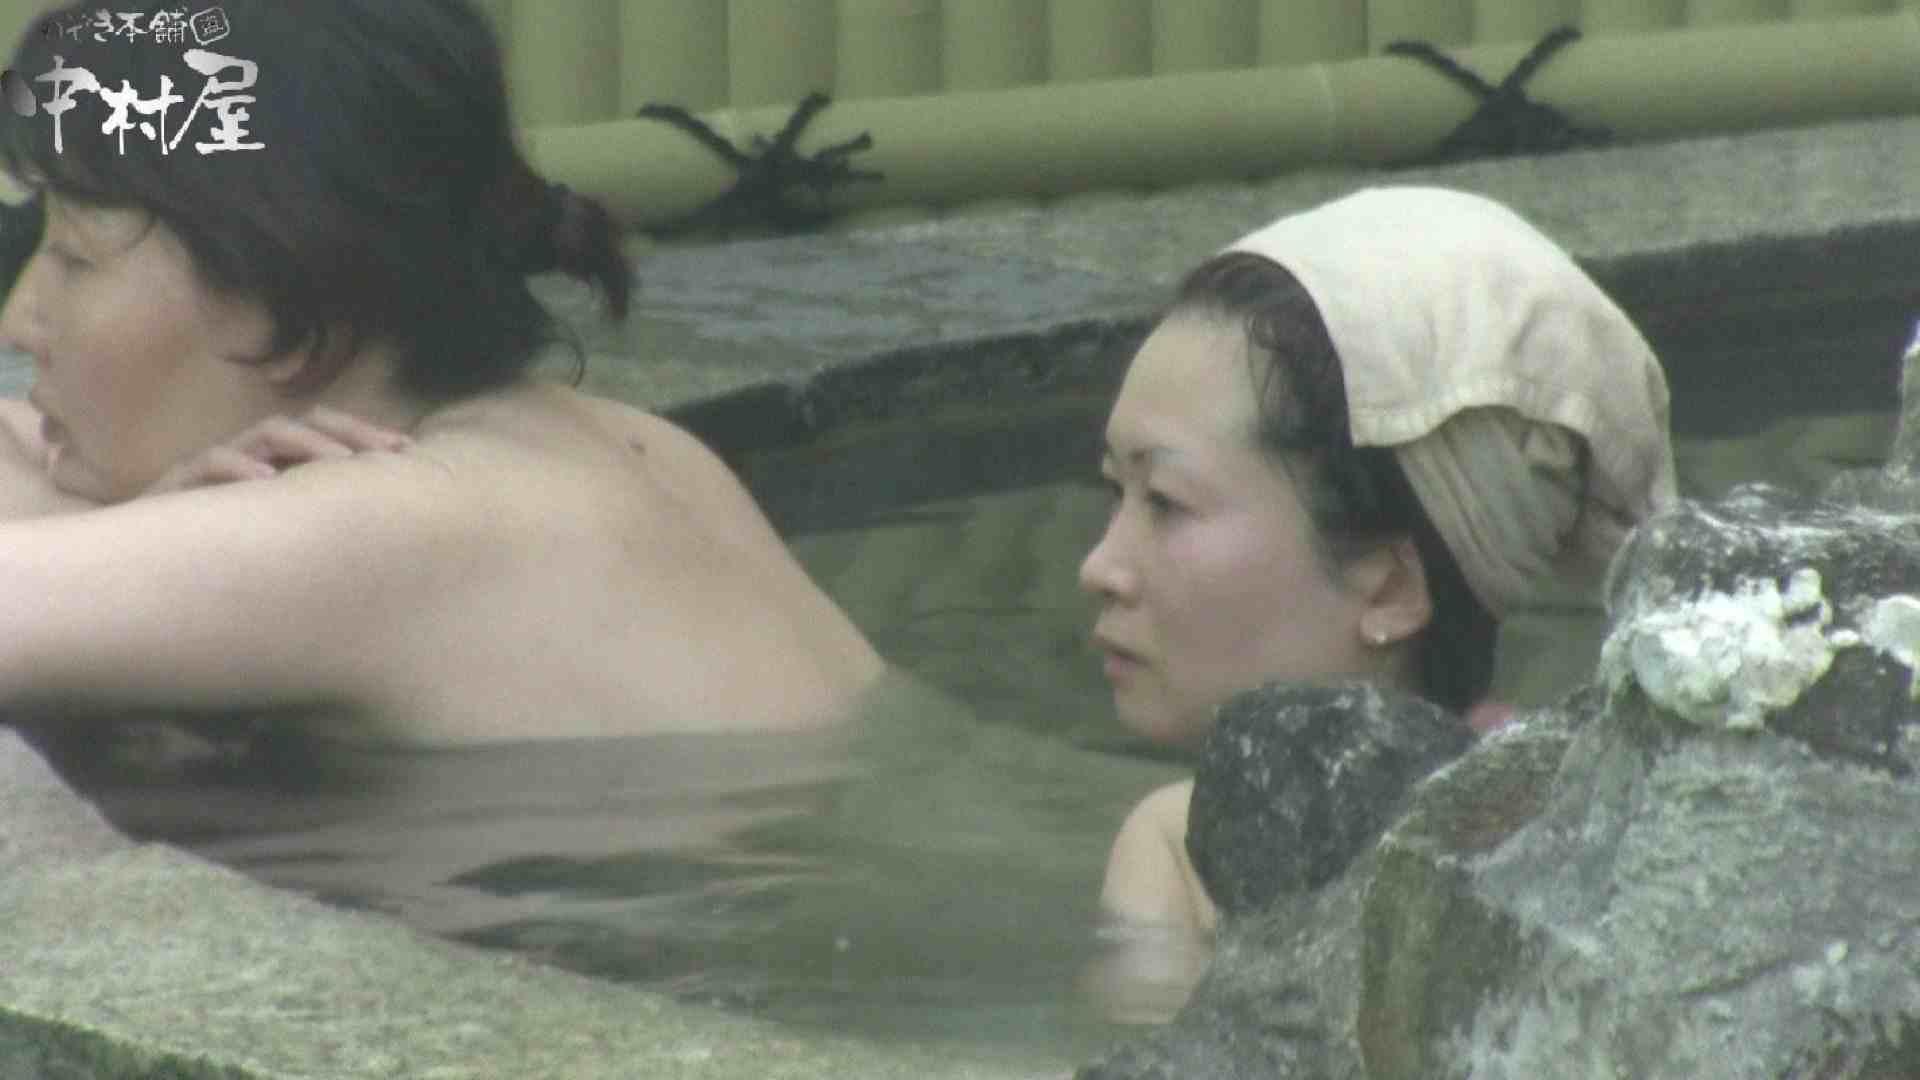 Aquaな露天風呂Vol.906 露天風呂編 | 盗撮シリーズ  86PIX 69